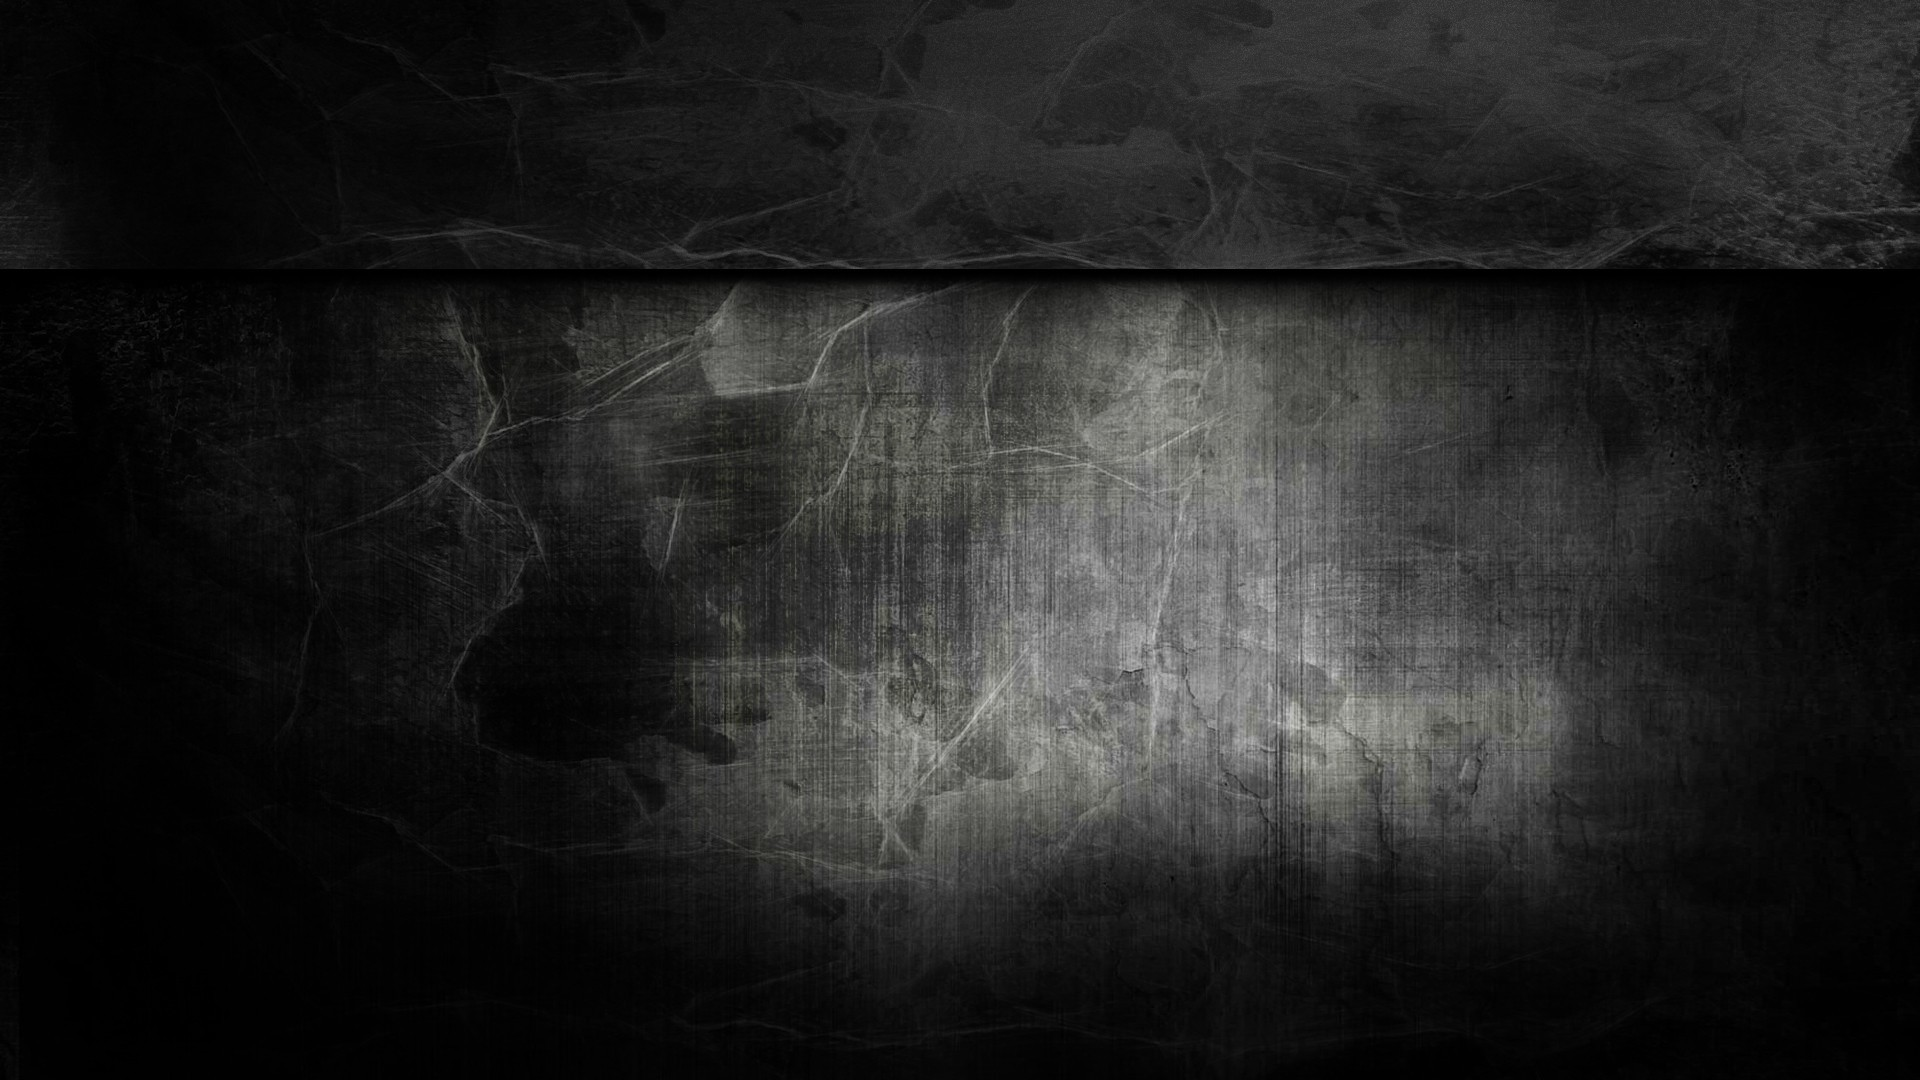 Res: 1920x1080, Black Metal Grunge Textures Background